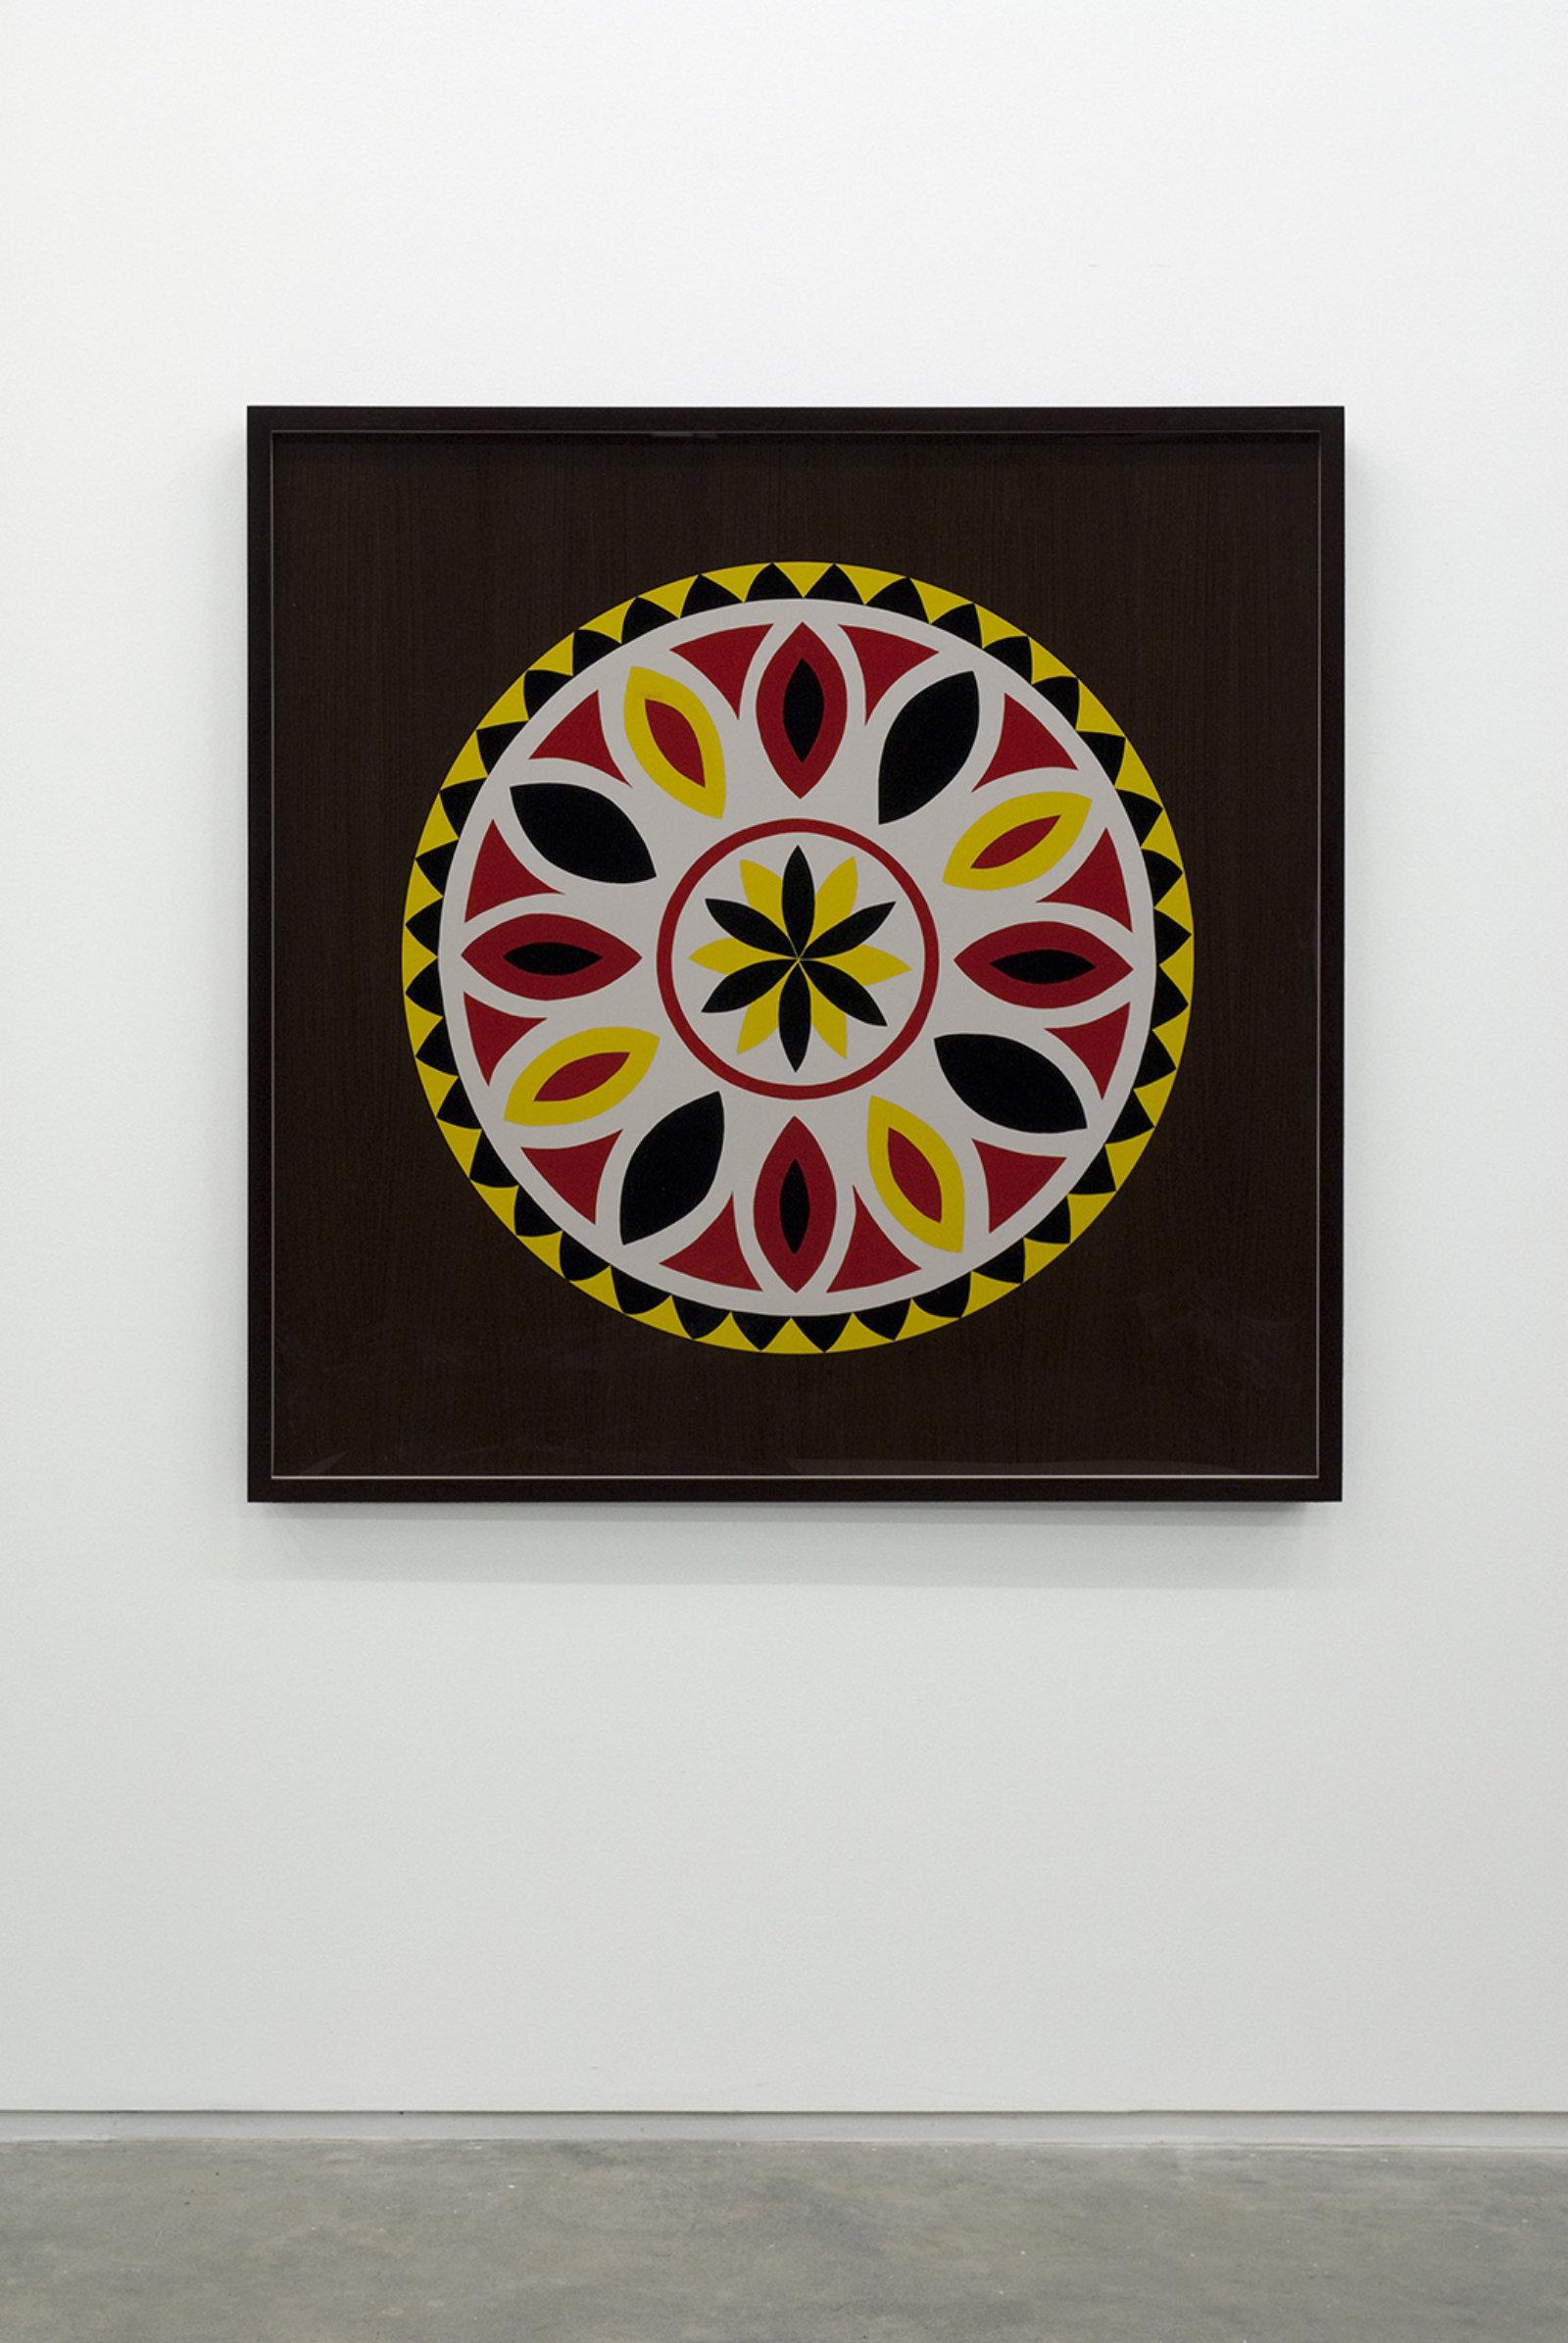 Myfanwy MacLeod, Hex VIII, 2009, enamel on wood, 48 x 48 in. (122 x 122 cm) by Myfanwy MacLeod